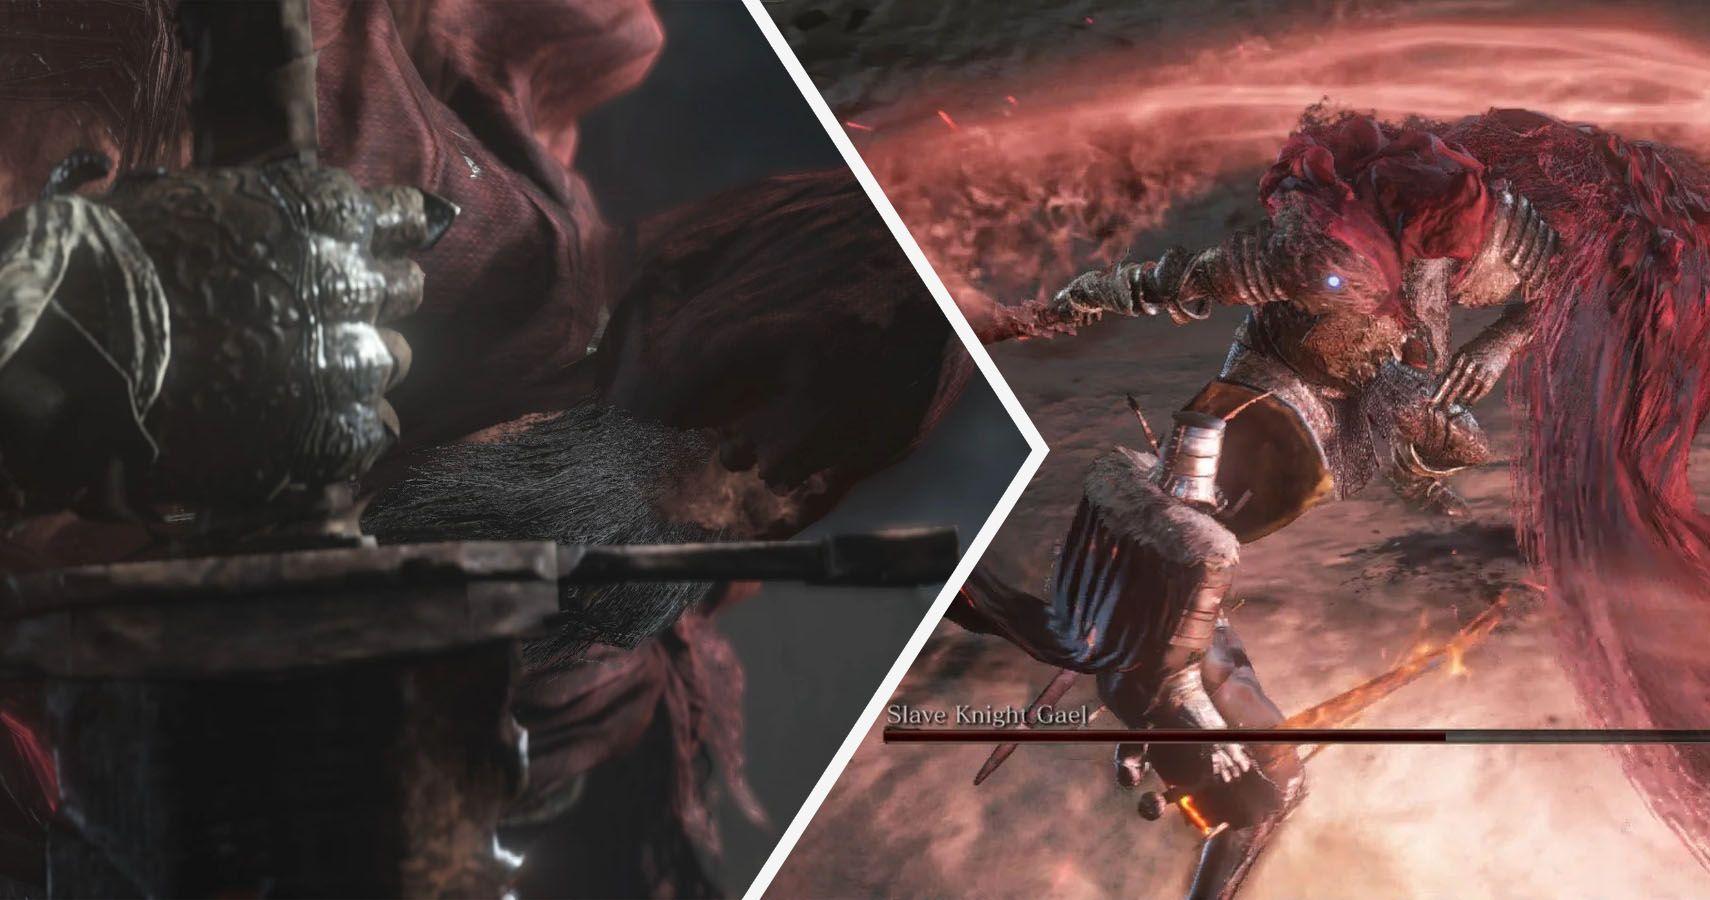 Dark Souls 3: Slave Knight Gael Boss Fight Guide